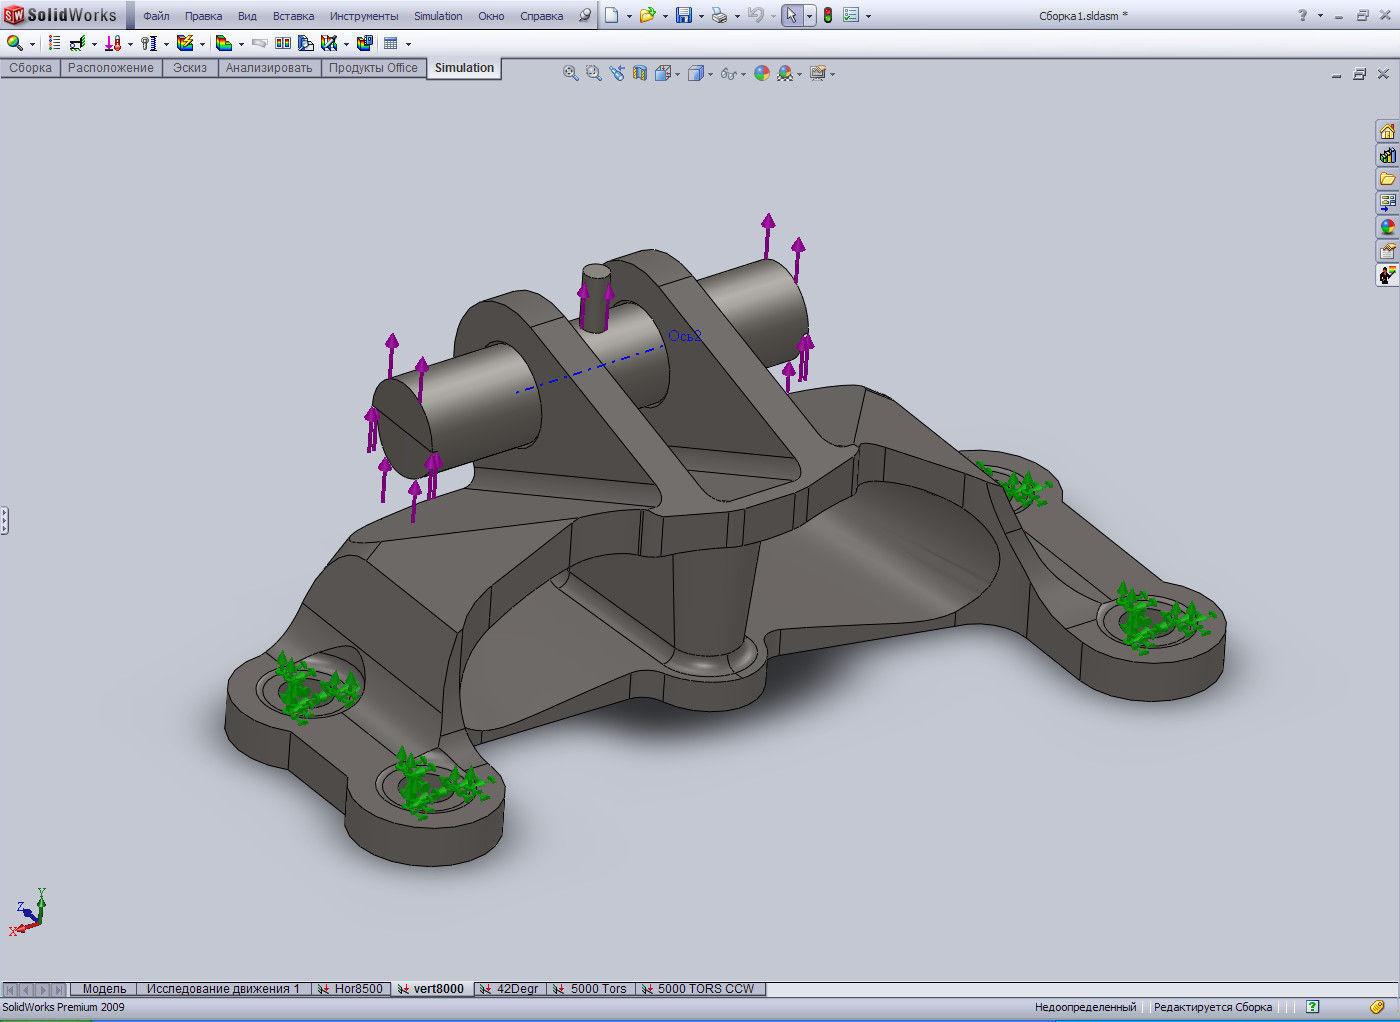 Bracket Design 3 Free 3d Model